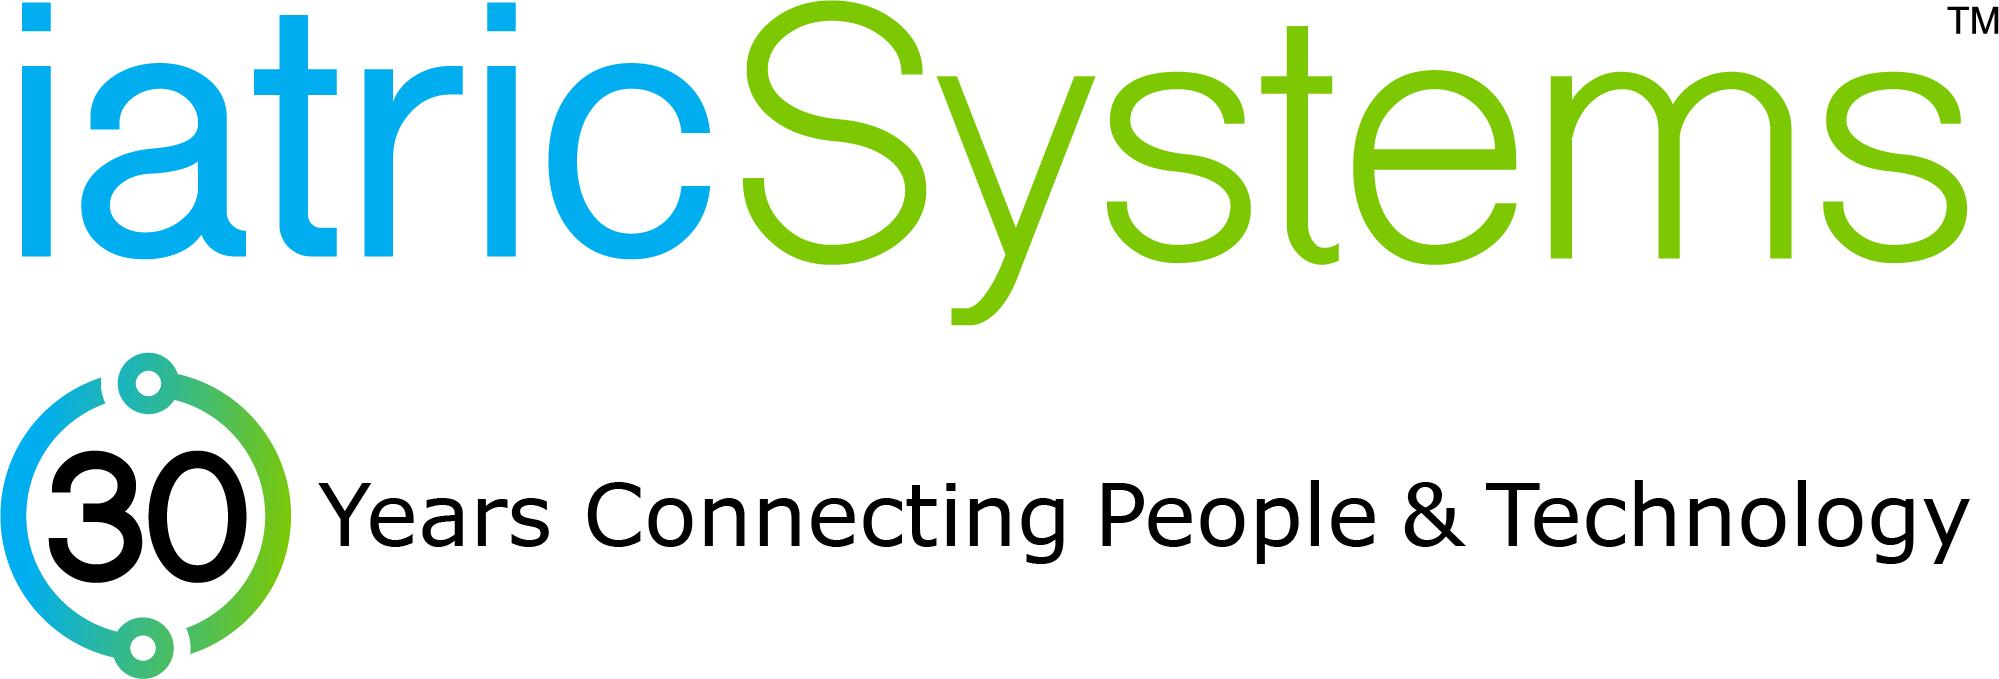 iatricSystems-logo-TM-RGB